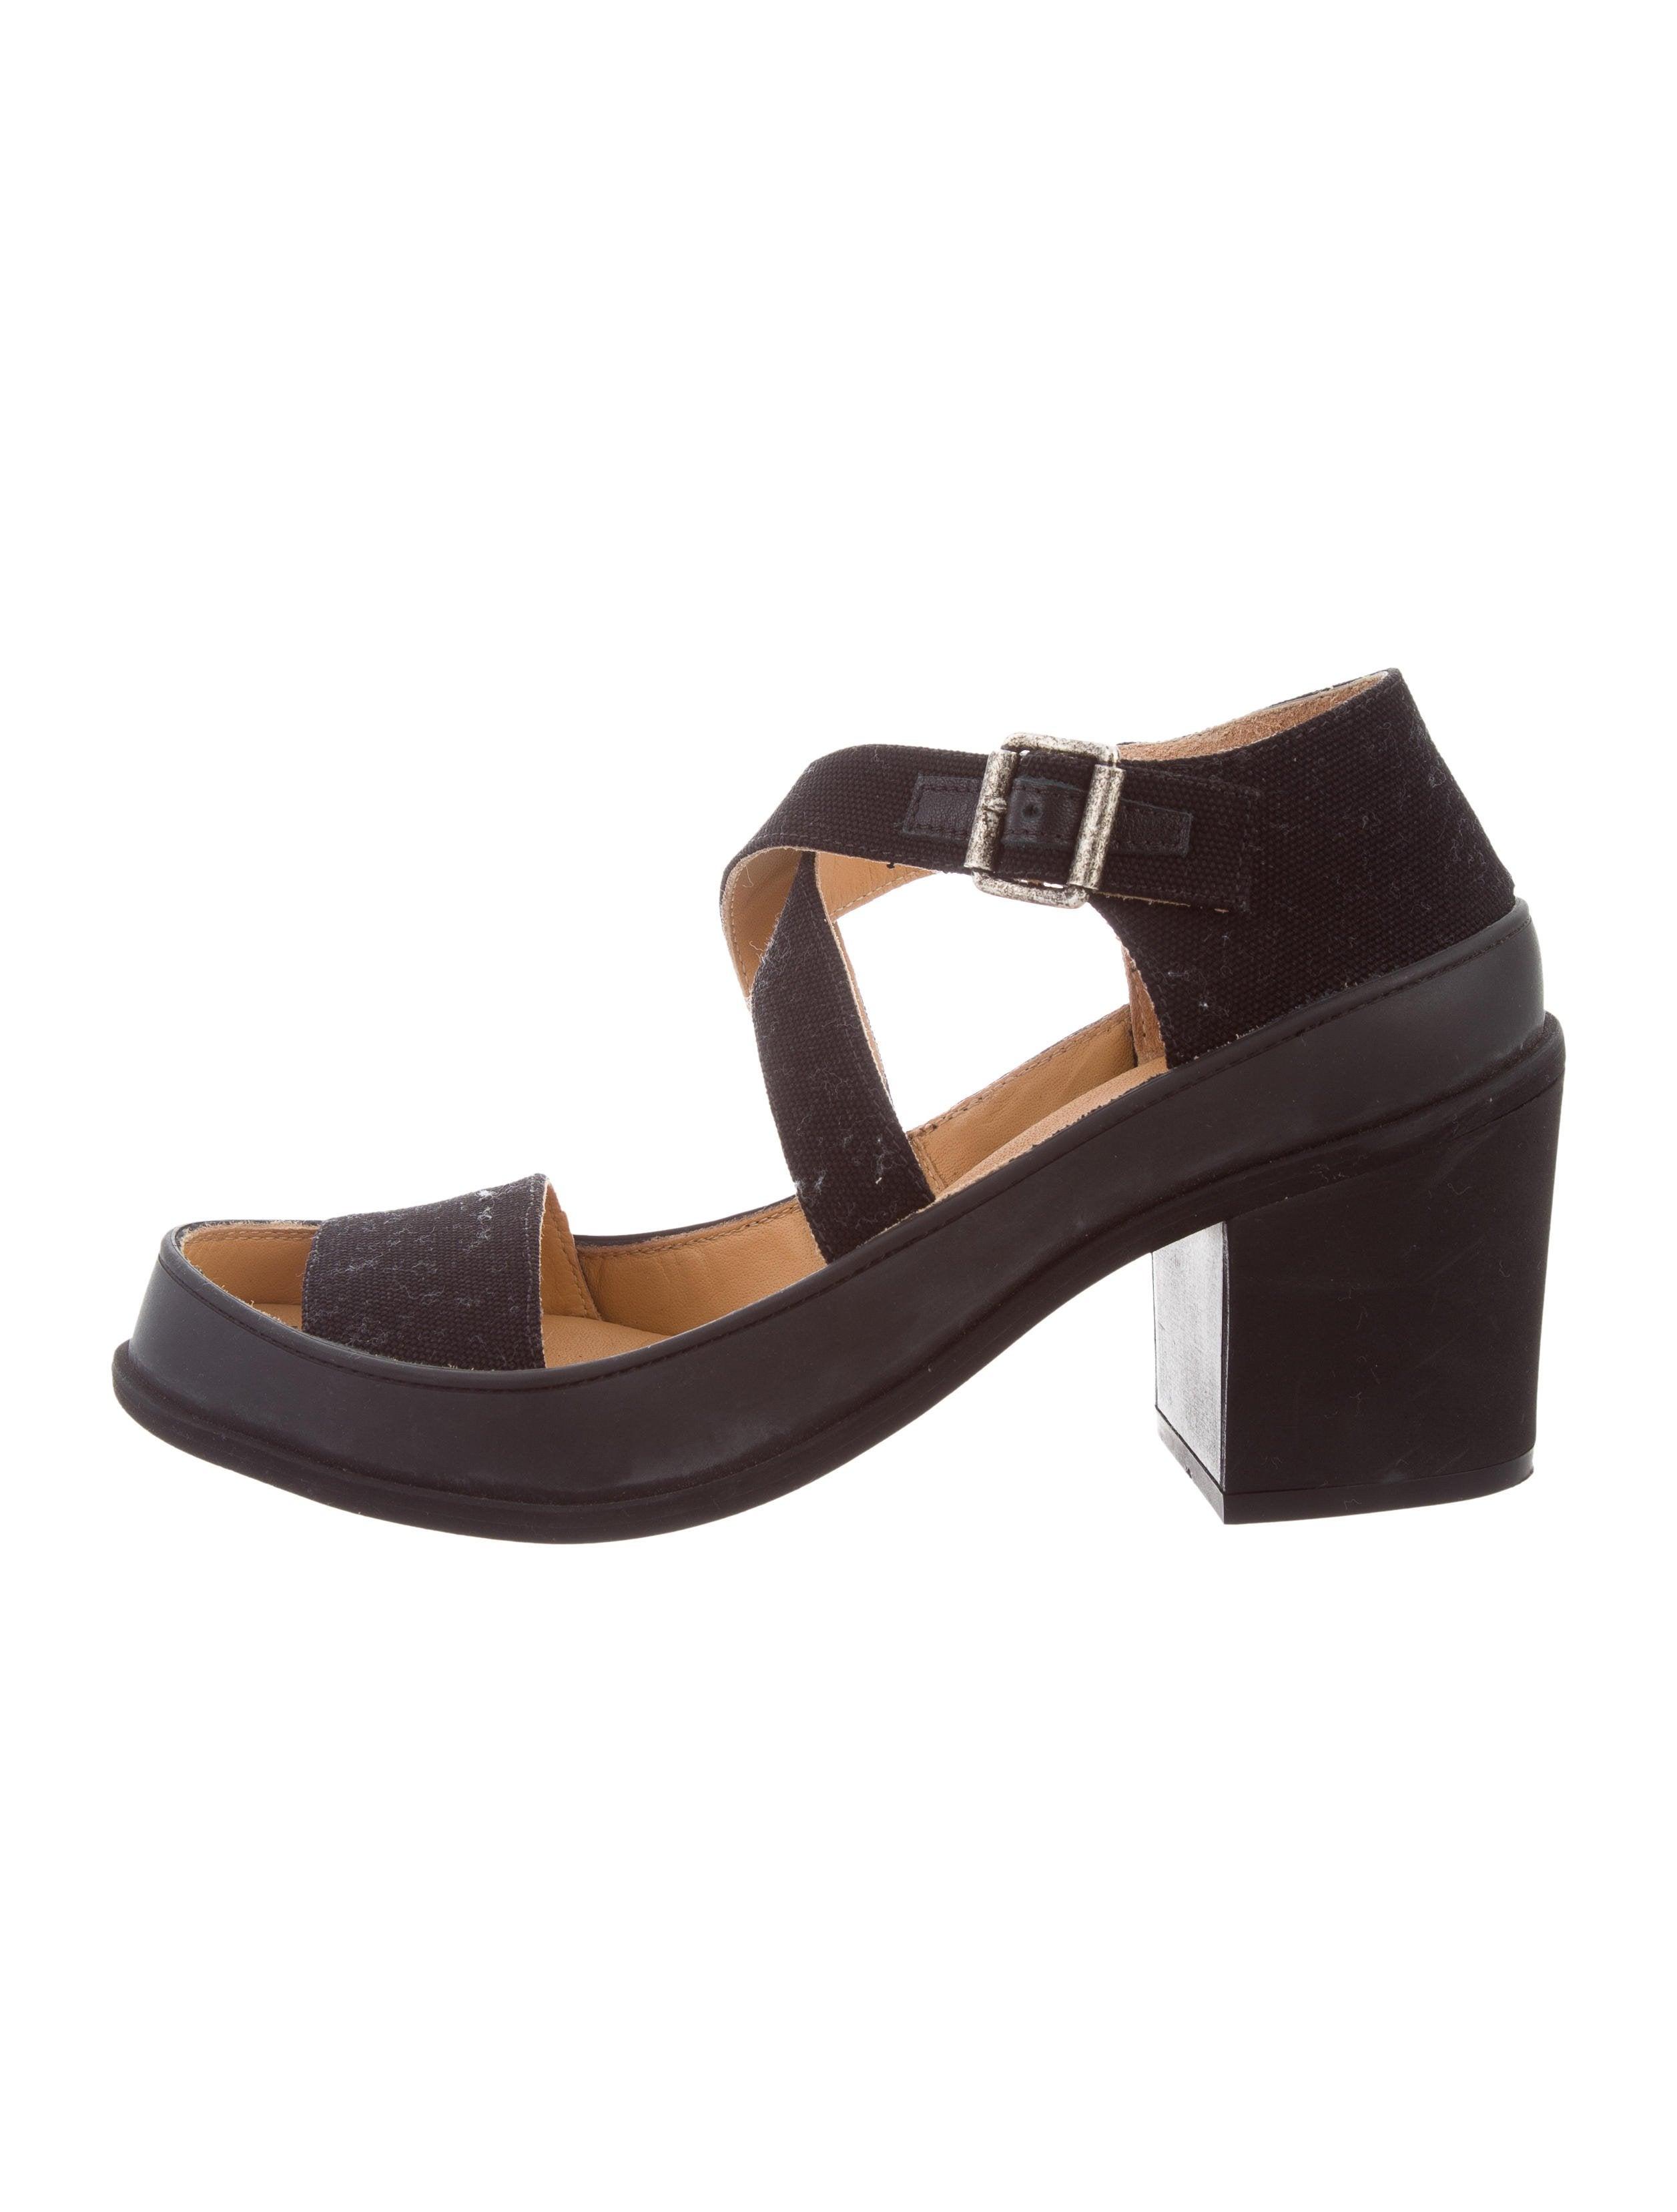 Multi-strap canvas and leather sandals Maison Martin Margiela Sale Order Sale Low Shipping Sale Online MIKmw2Bi